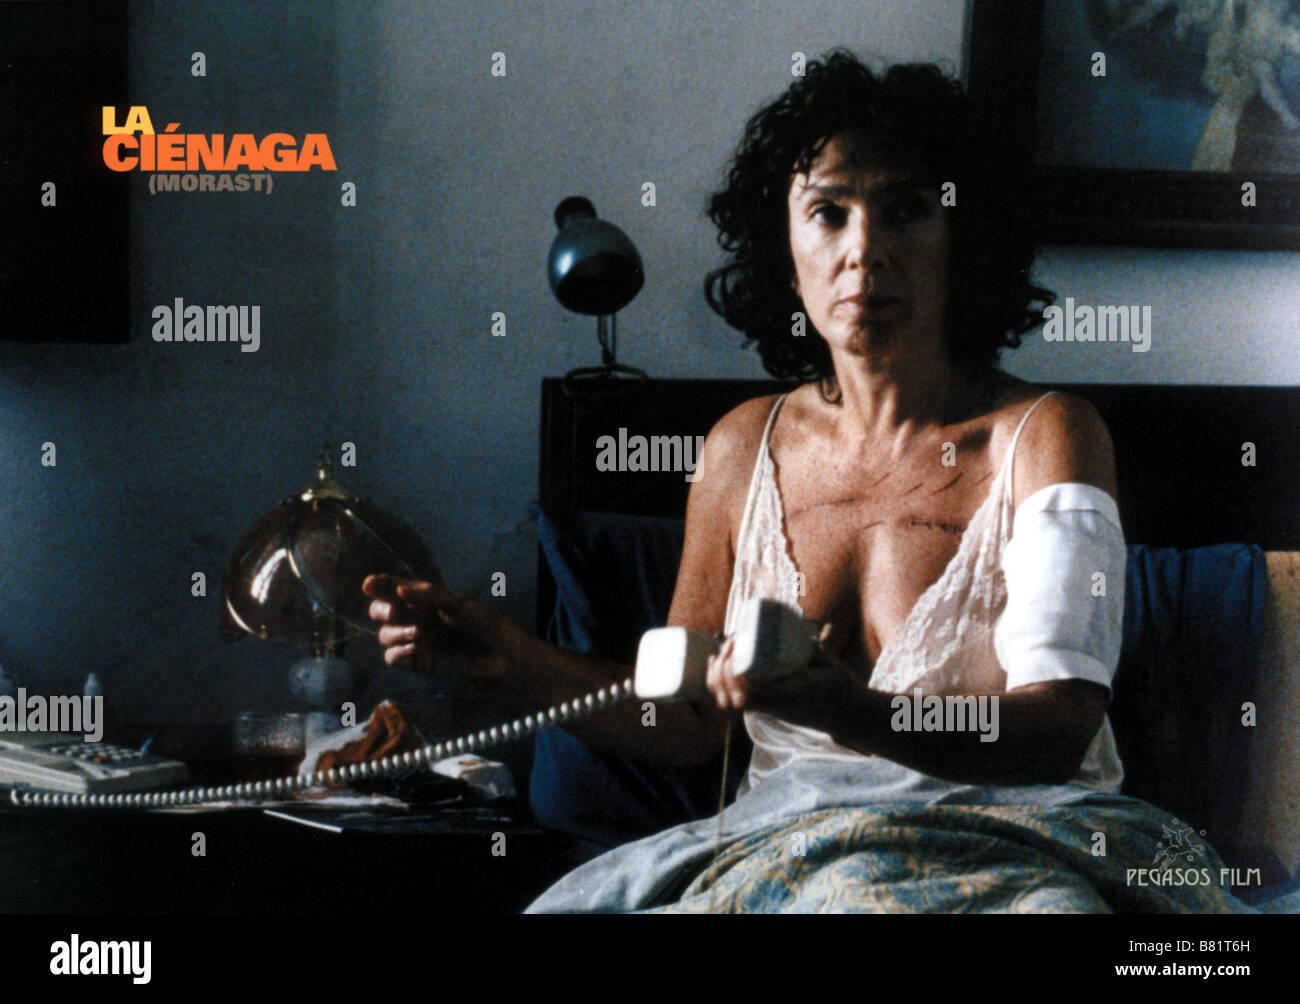 Graciela Borges Nude Photos 71